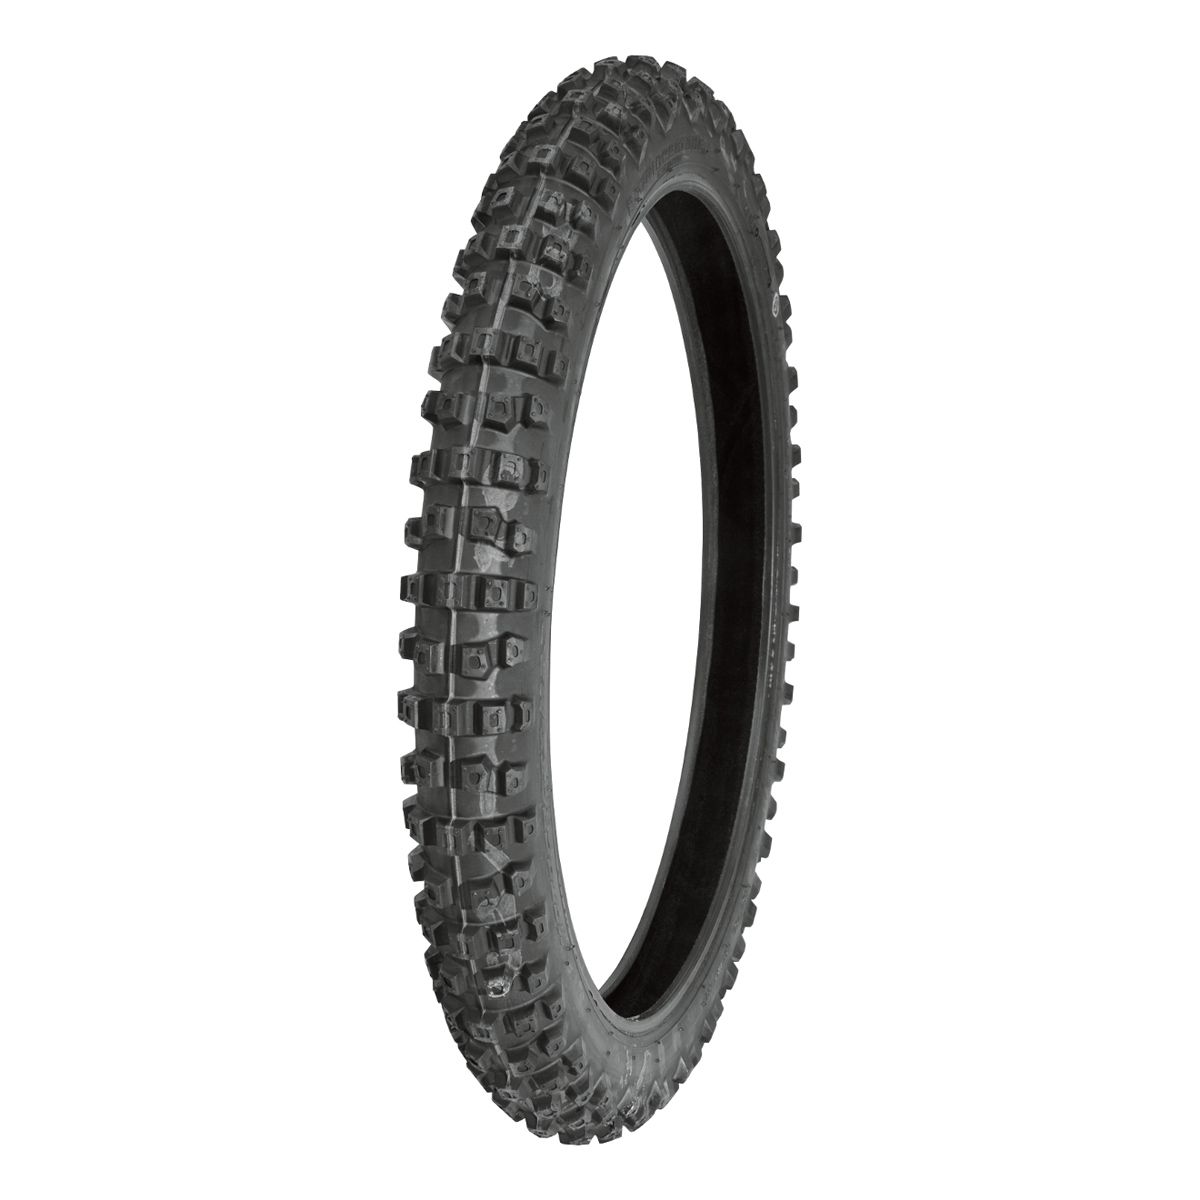 Bridgestone M23 70/100-17 H/T Front Tire